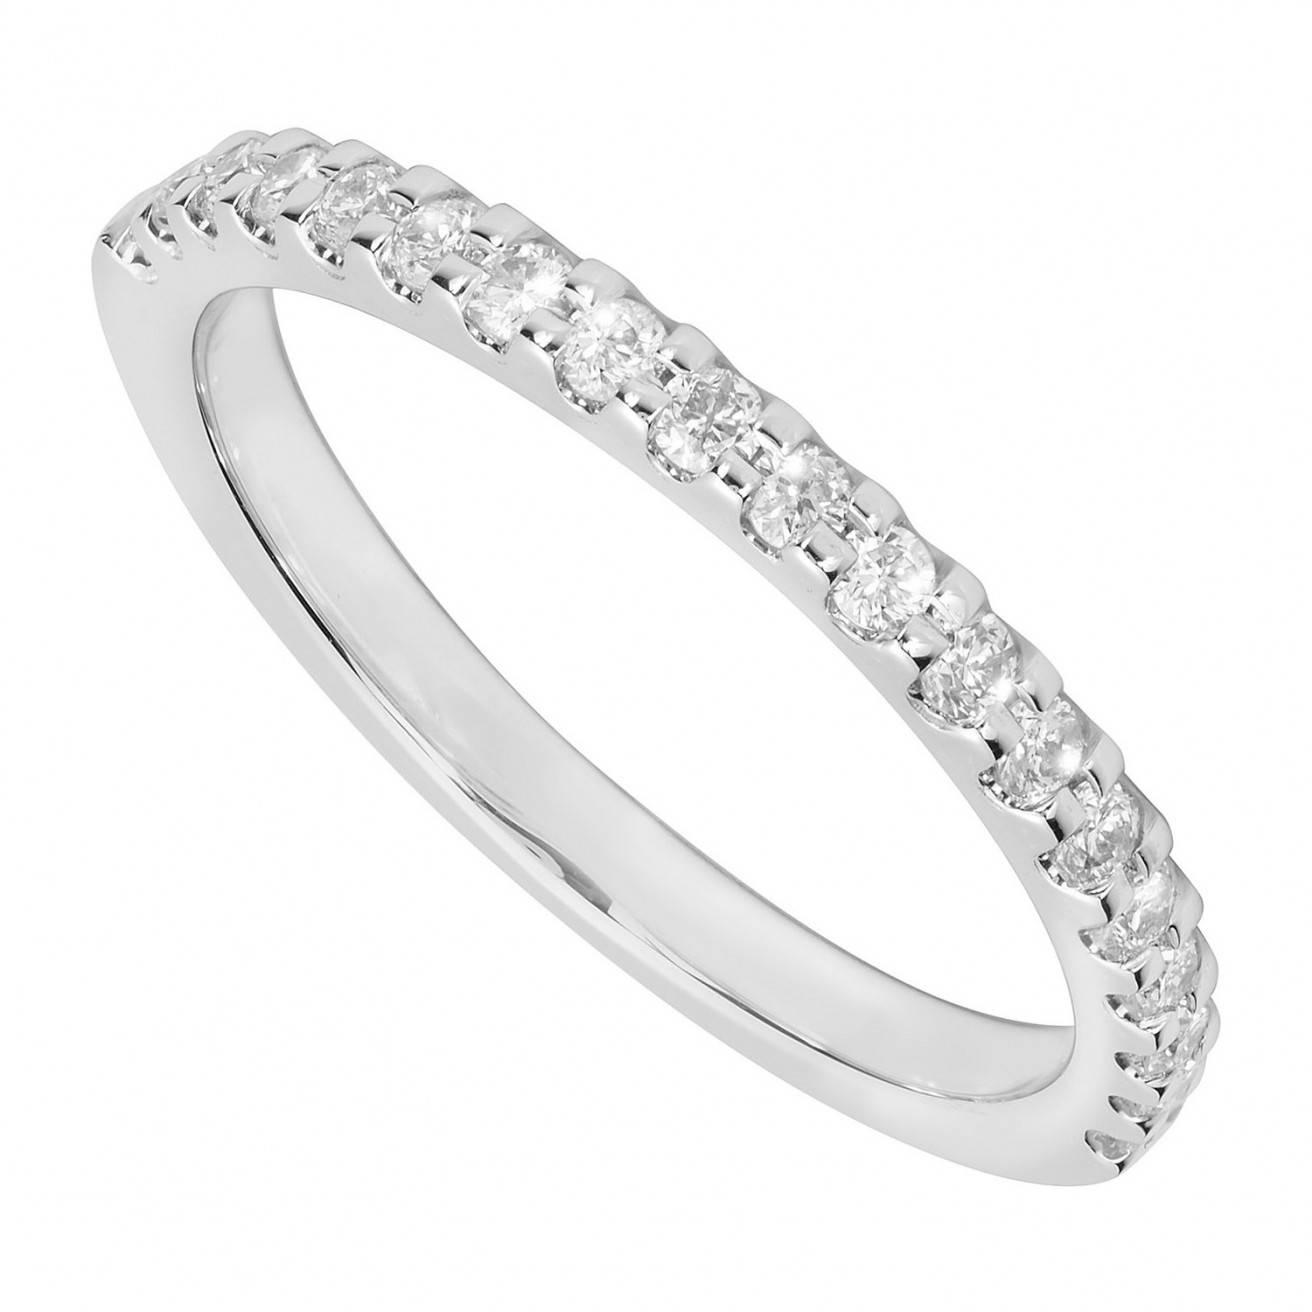 Buy A Diamond Wedding Ring Online – Fraser Hart Inside Diamond Wedding Rings (View 5 of 15)